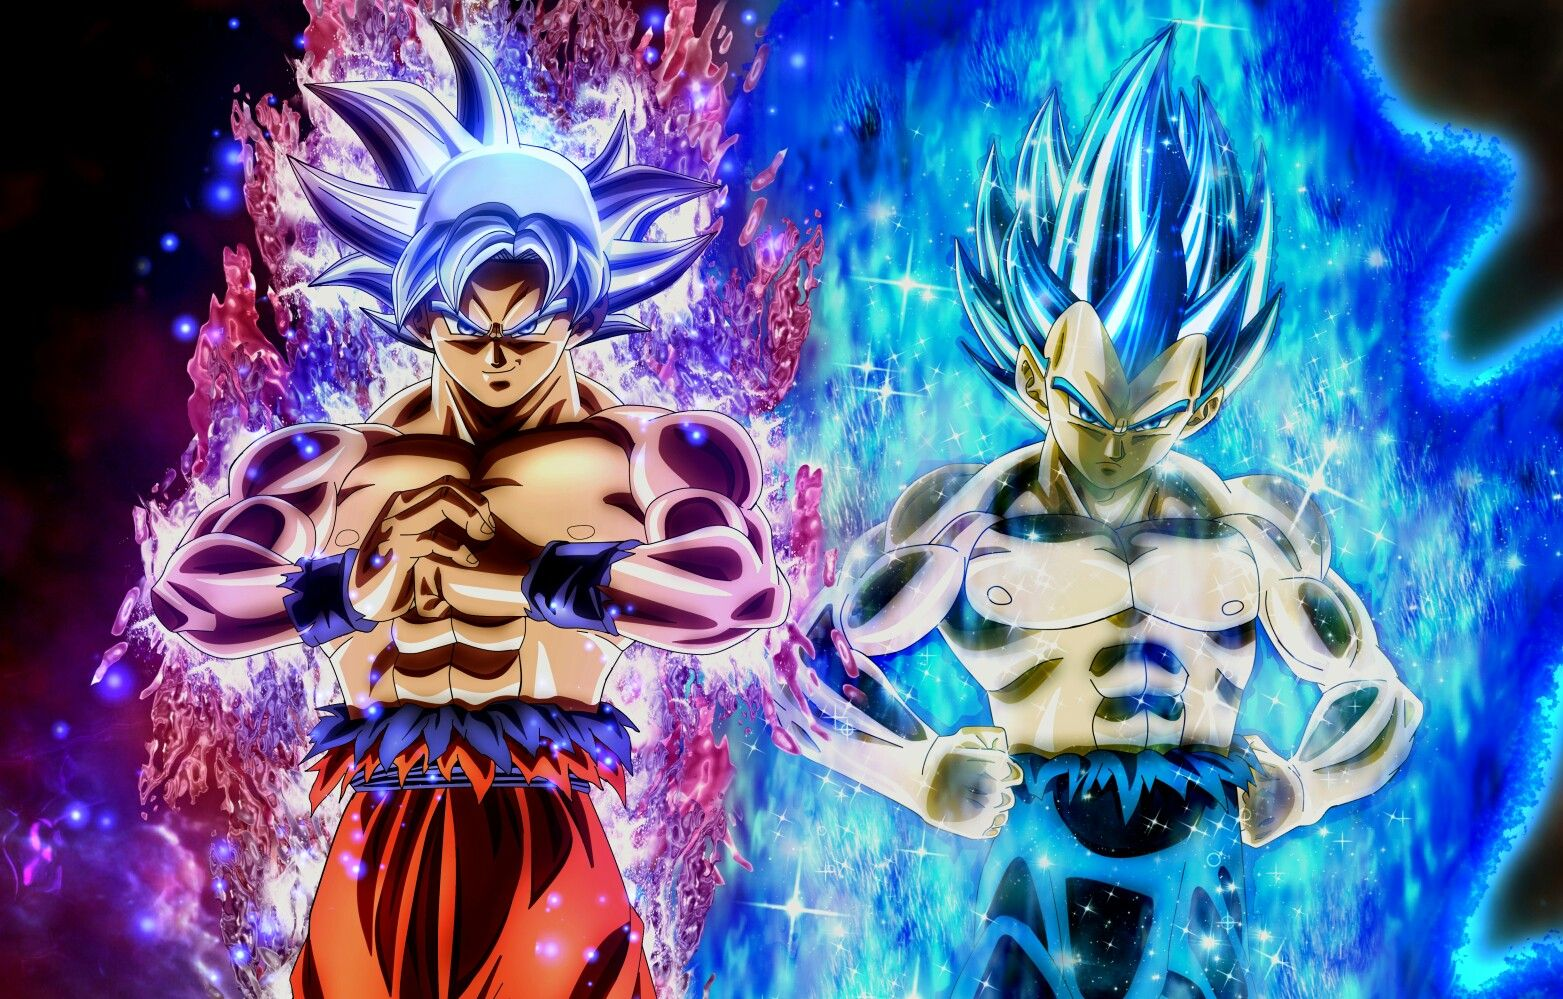 Goku And Vegeta In Their Final Forms Dragon Ball Super Artwork Anime Dragon Ball Dragon Ball Super Goku